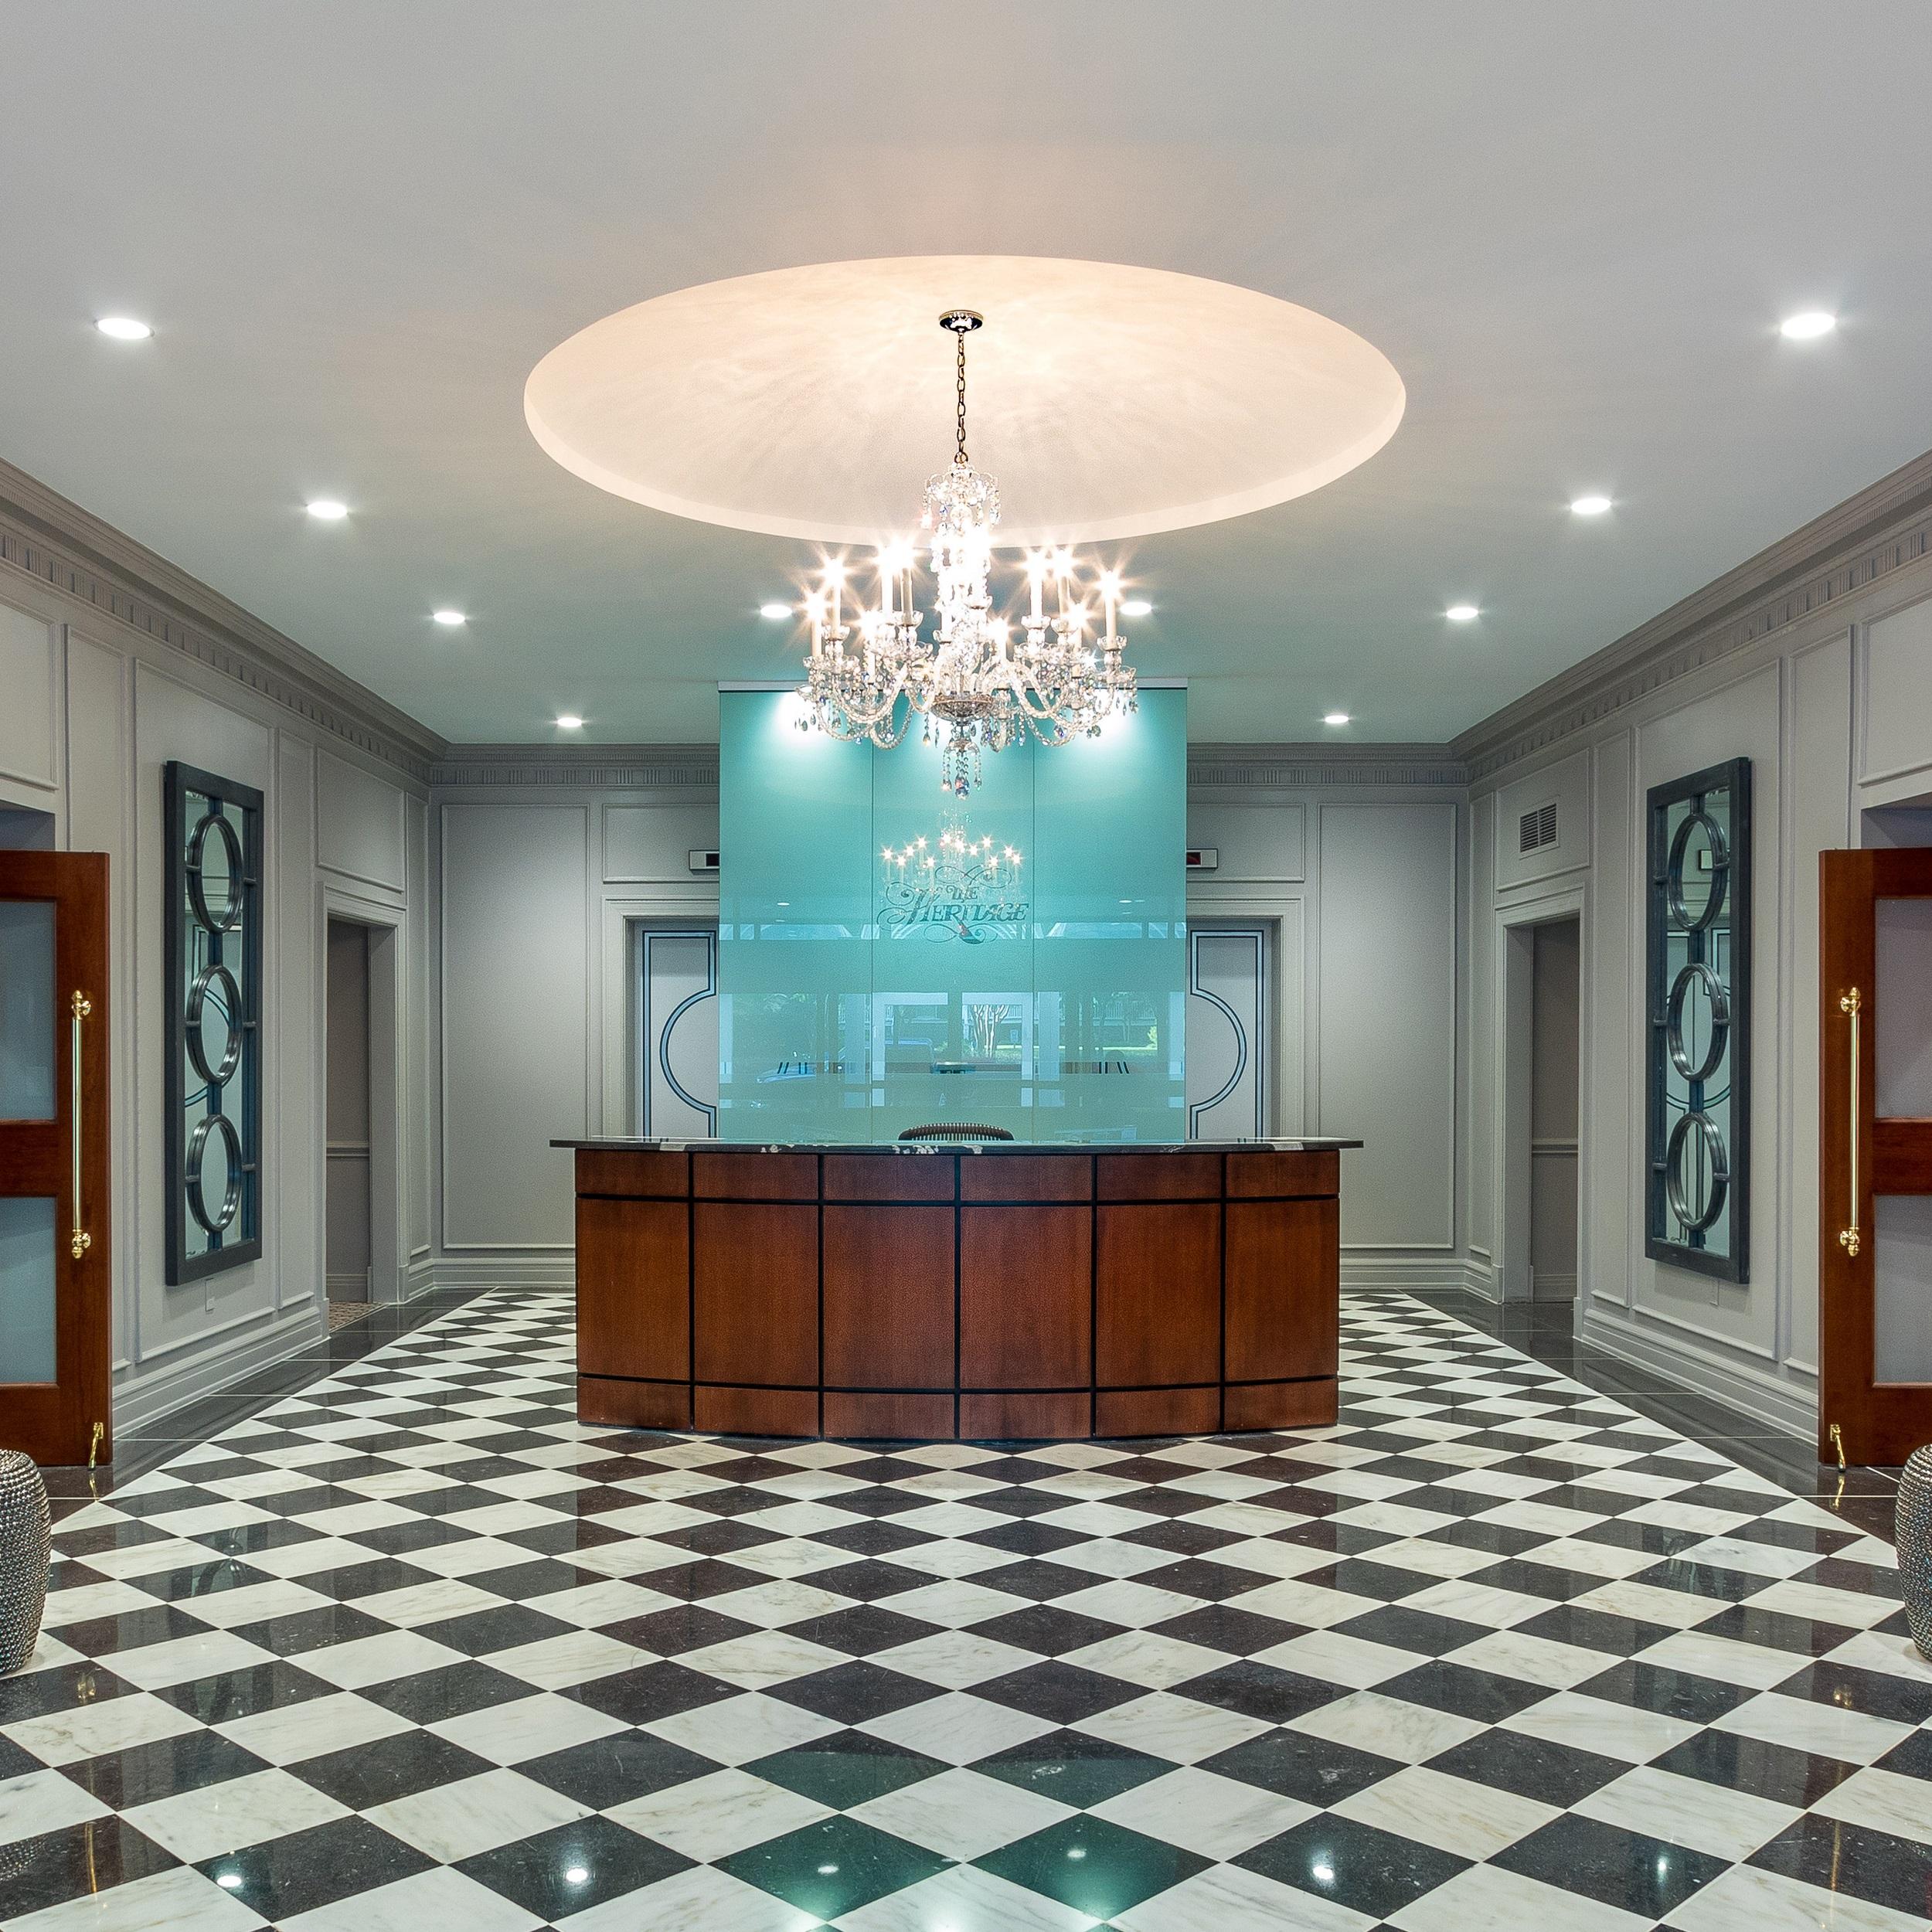 Heritage-Lobby-2-oswalddesign-Lres_CroppedSquare.jpg